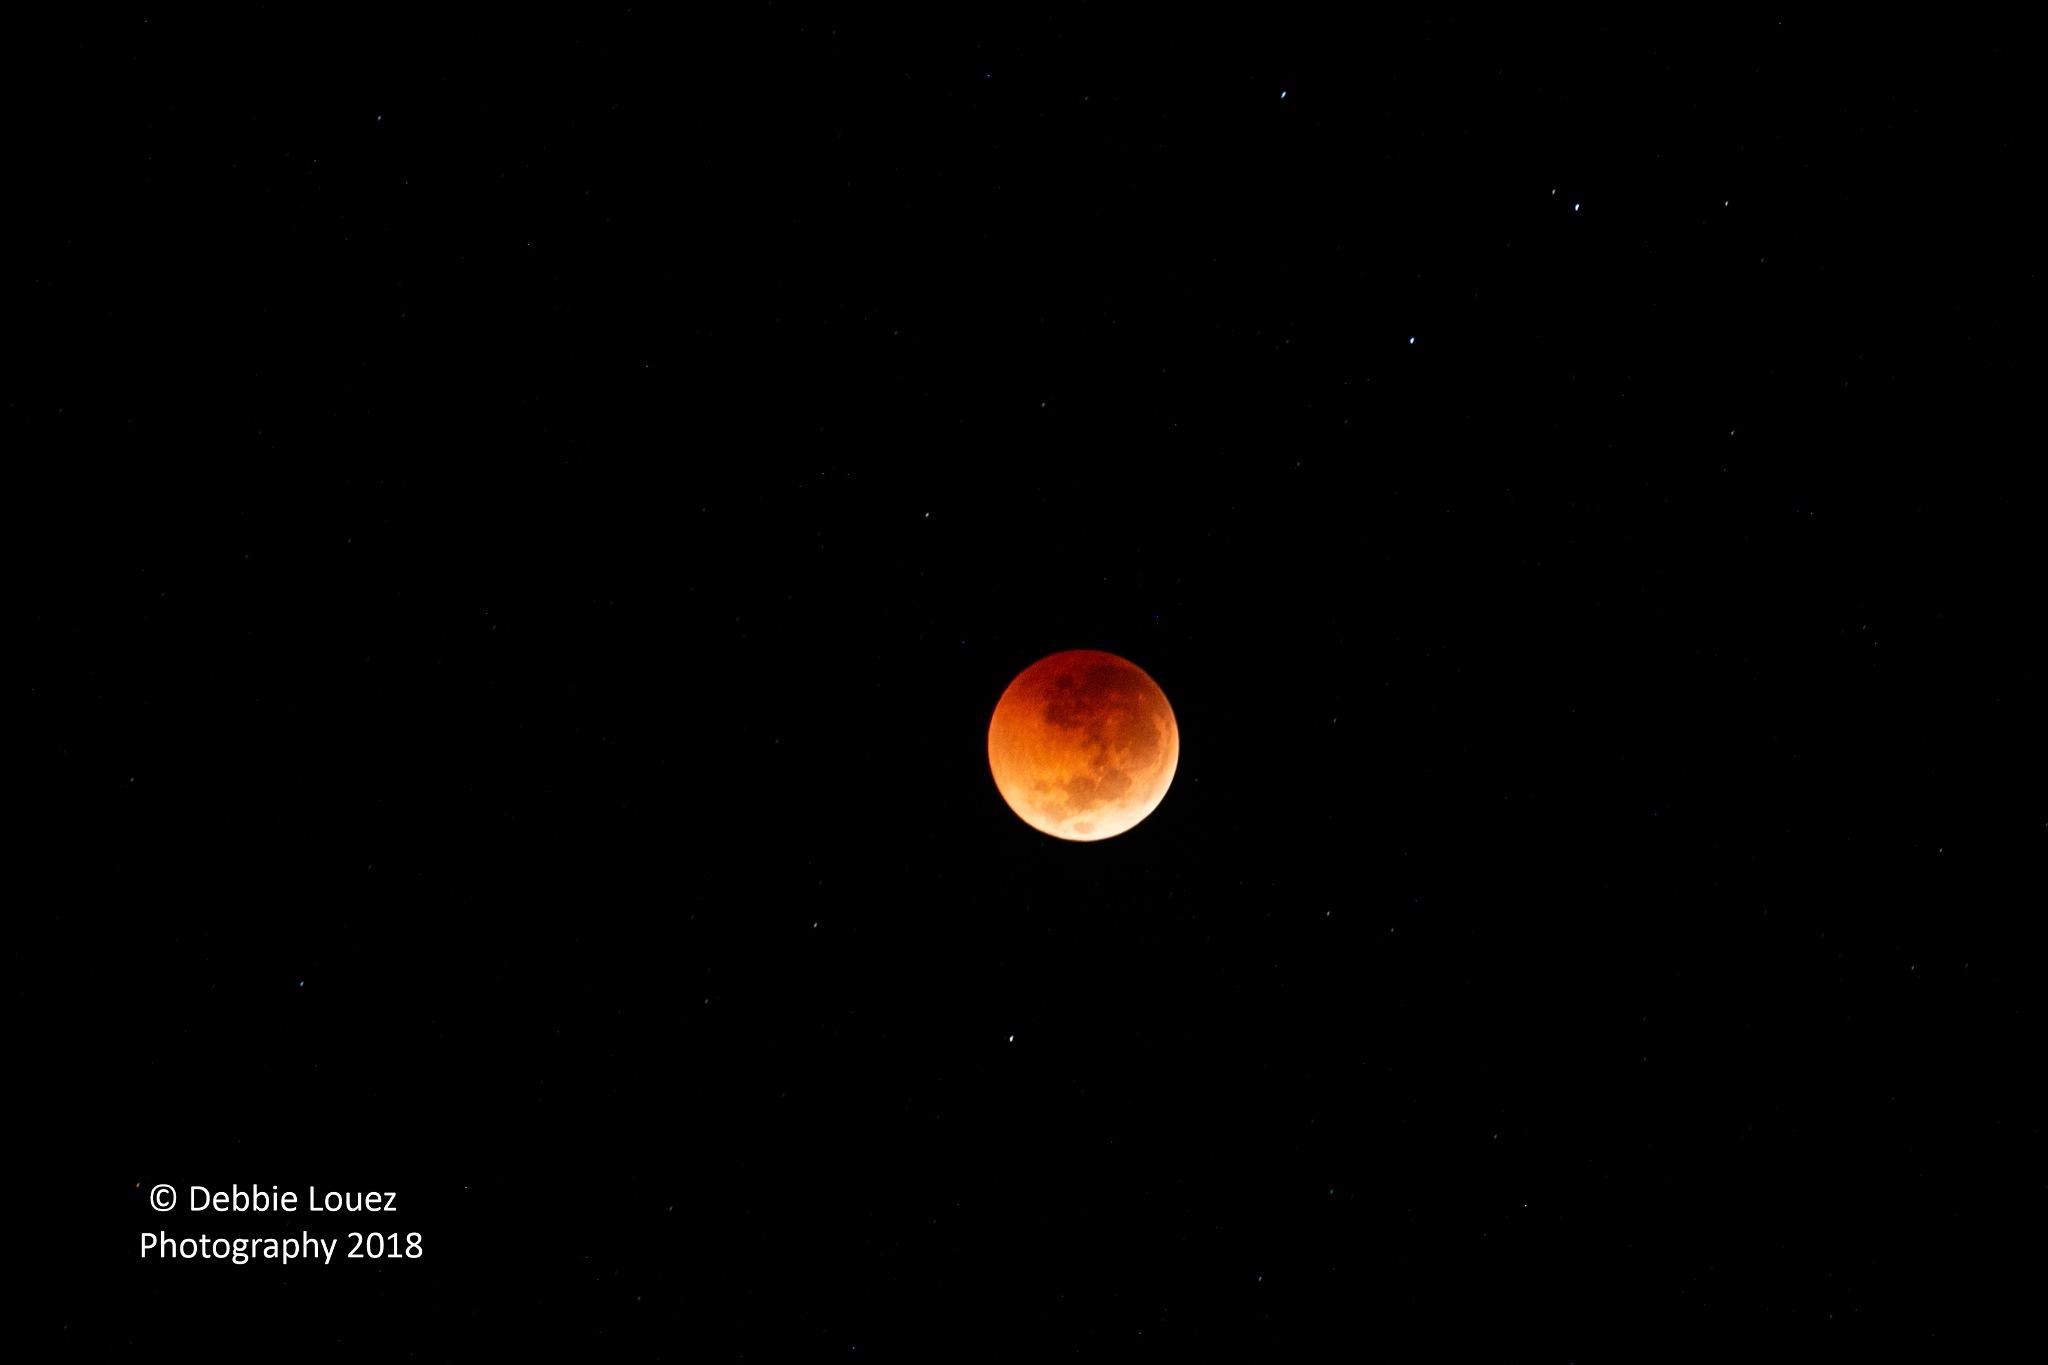 Blood Moon by Debbie Louez